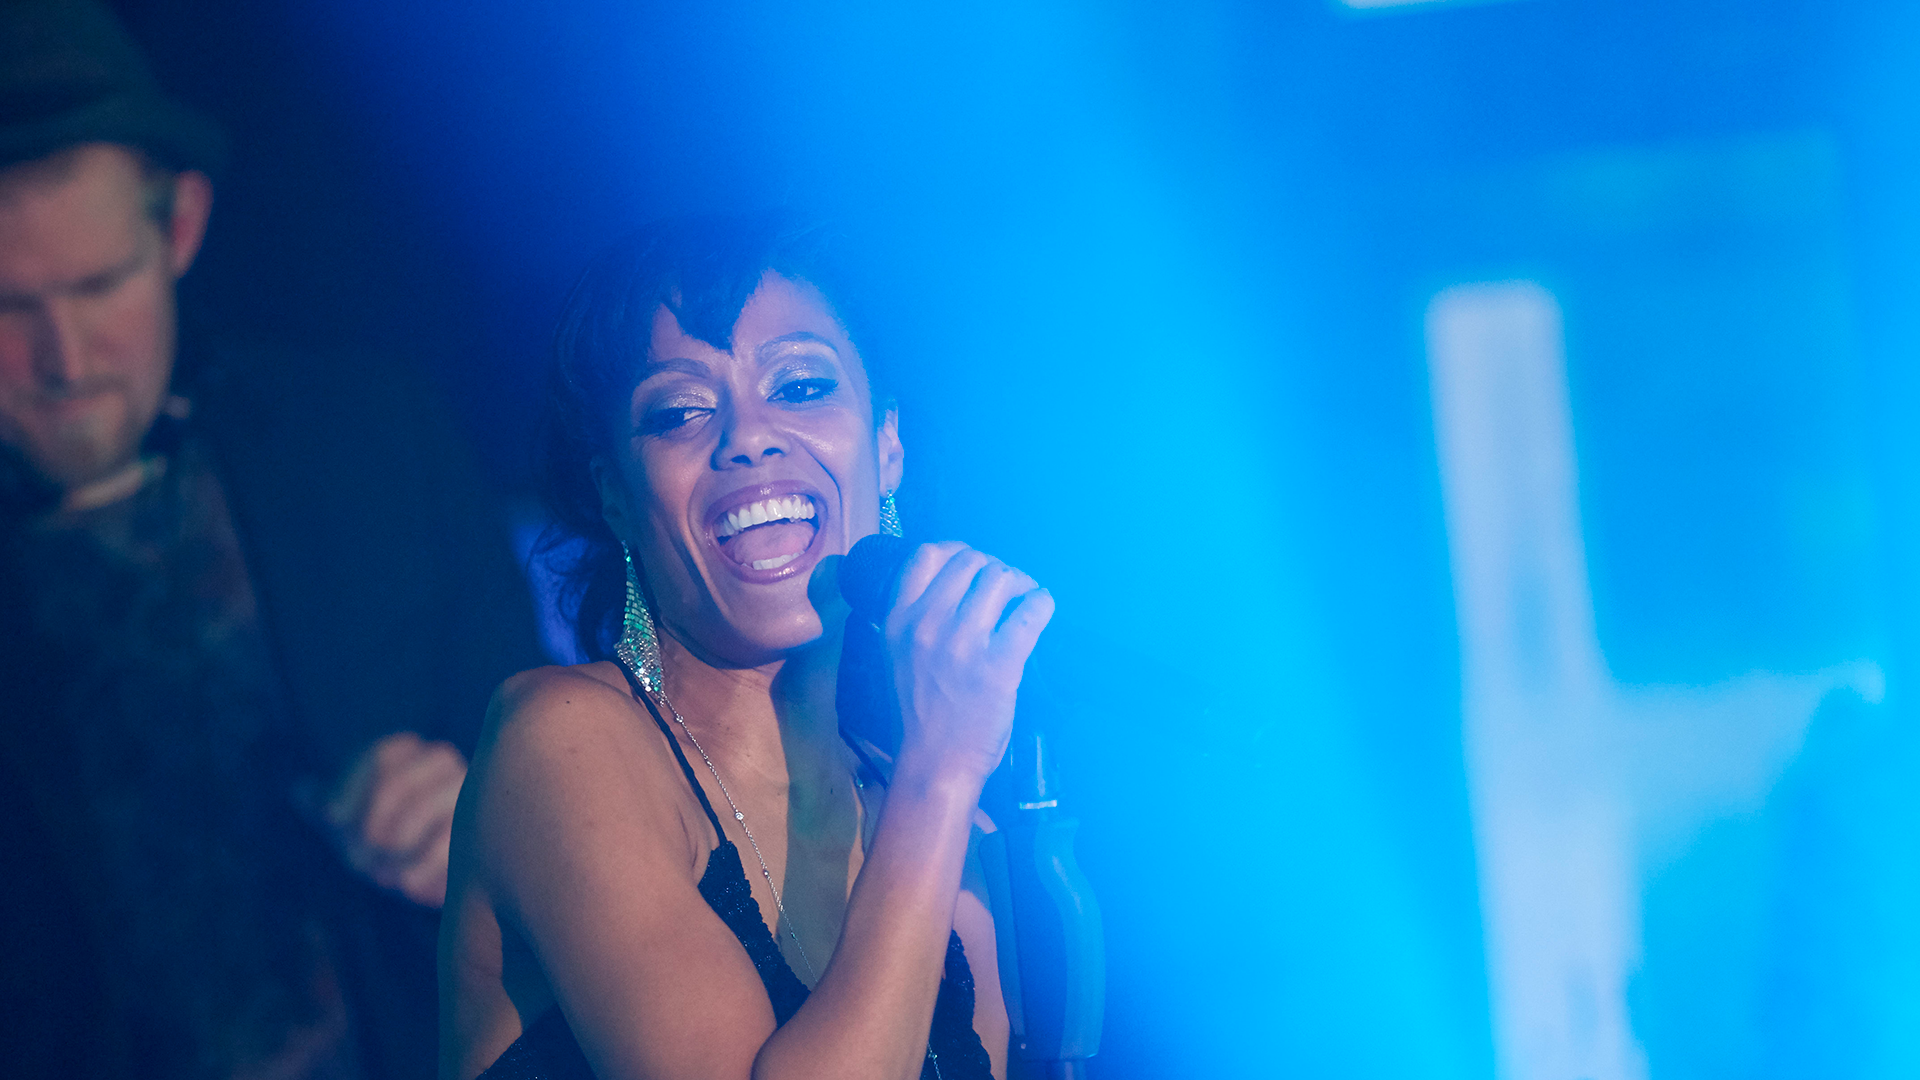 DJ-Neils-plus-Live-Acts-Eventband-Eventact-Online-Live-2021-01